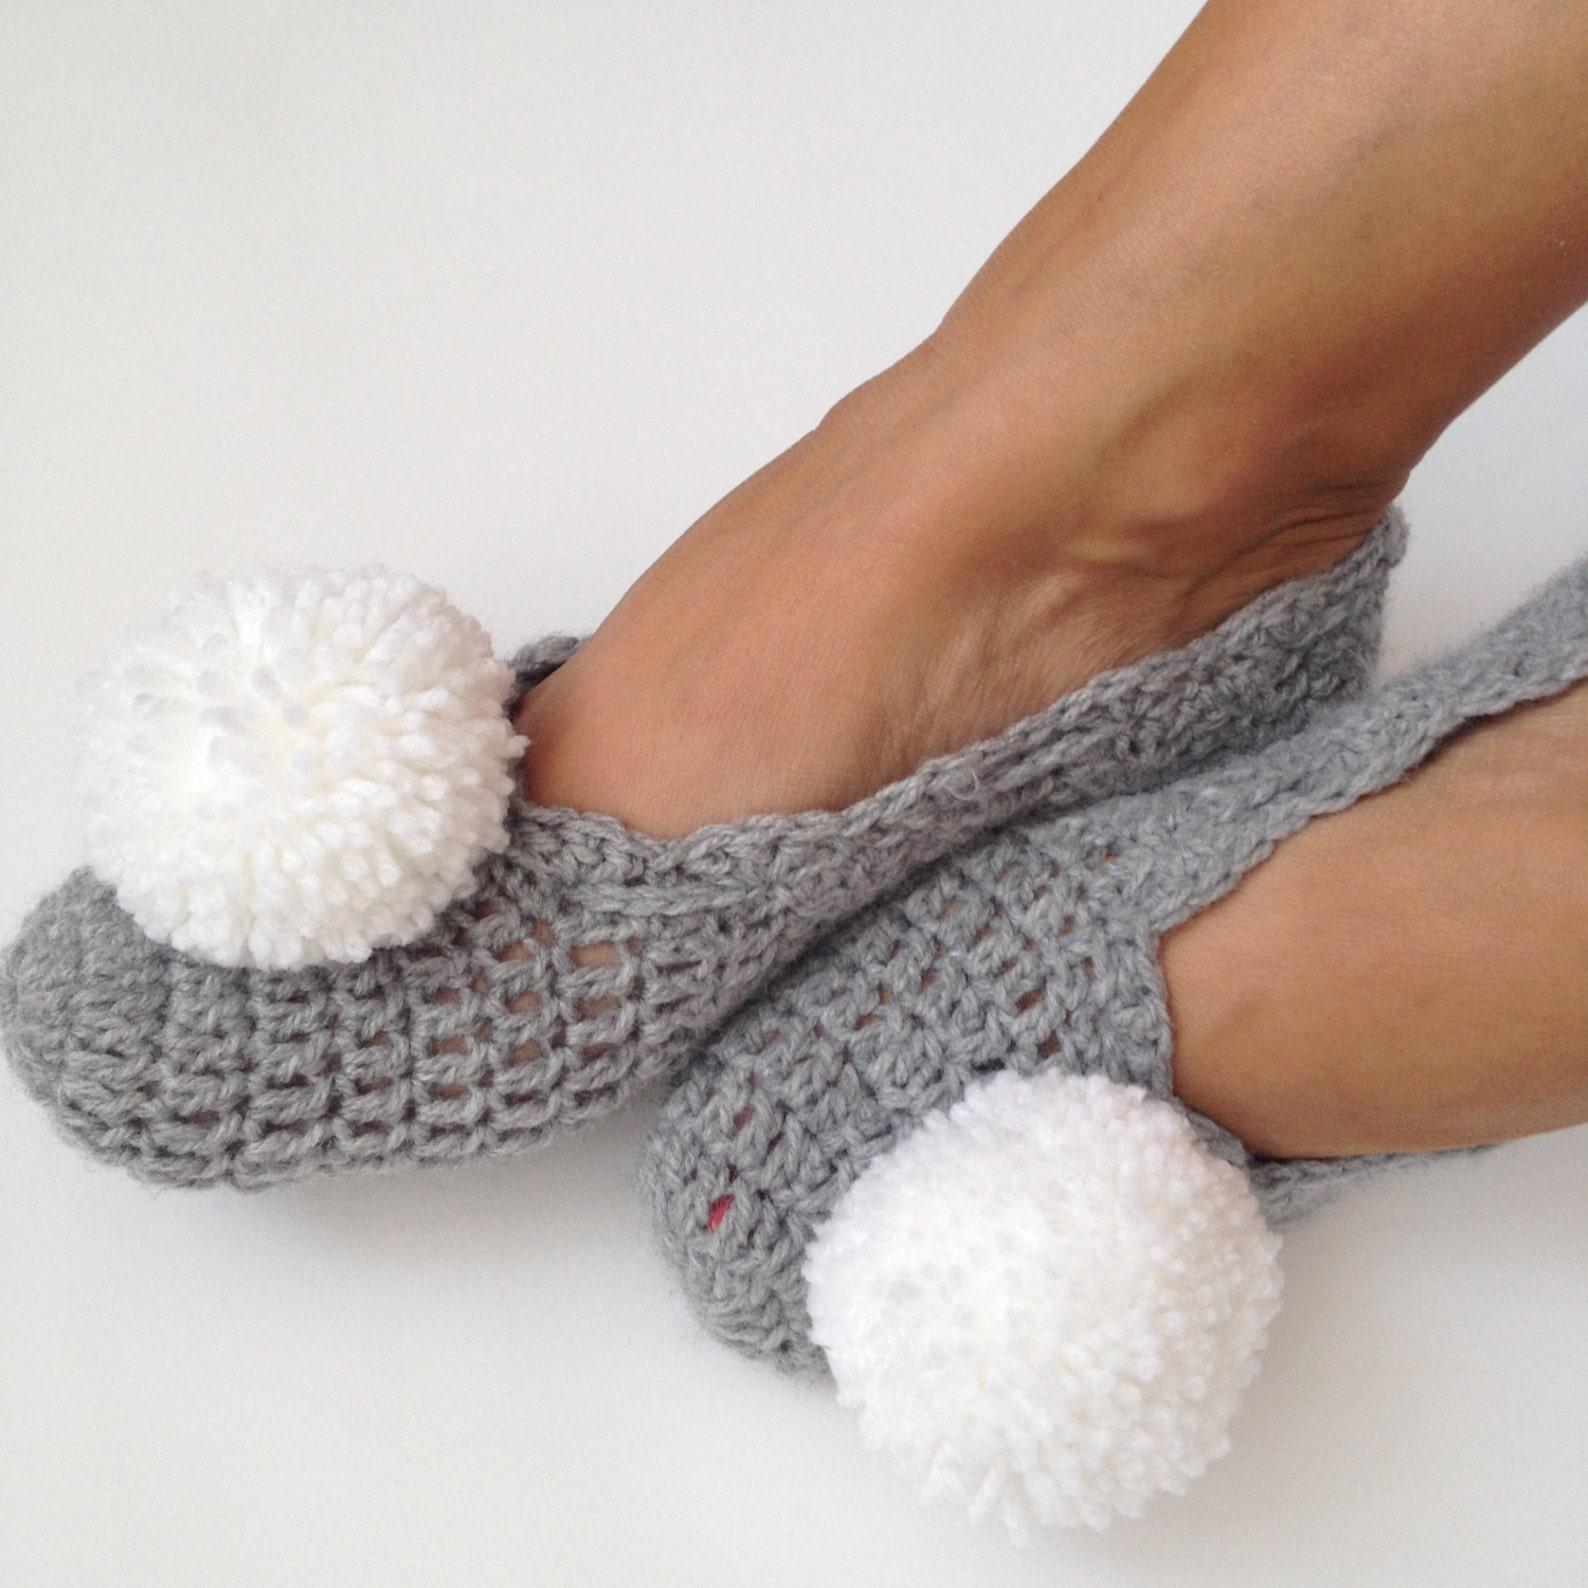 crochet slippers,christmas stocking,ballet flats,handmade slippers,crochet women slippers,cozy slippers,wedding flats,home silpp